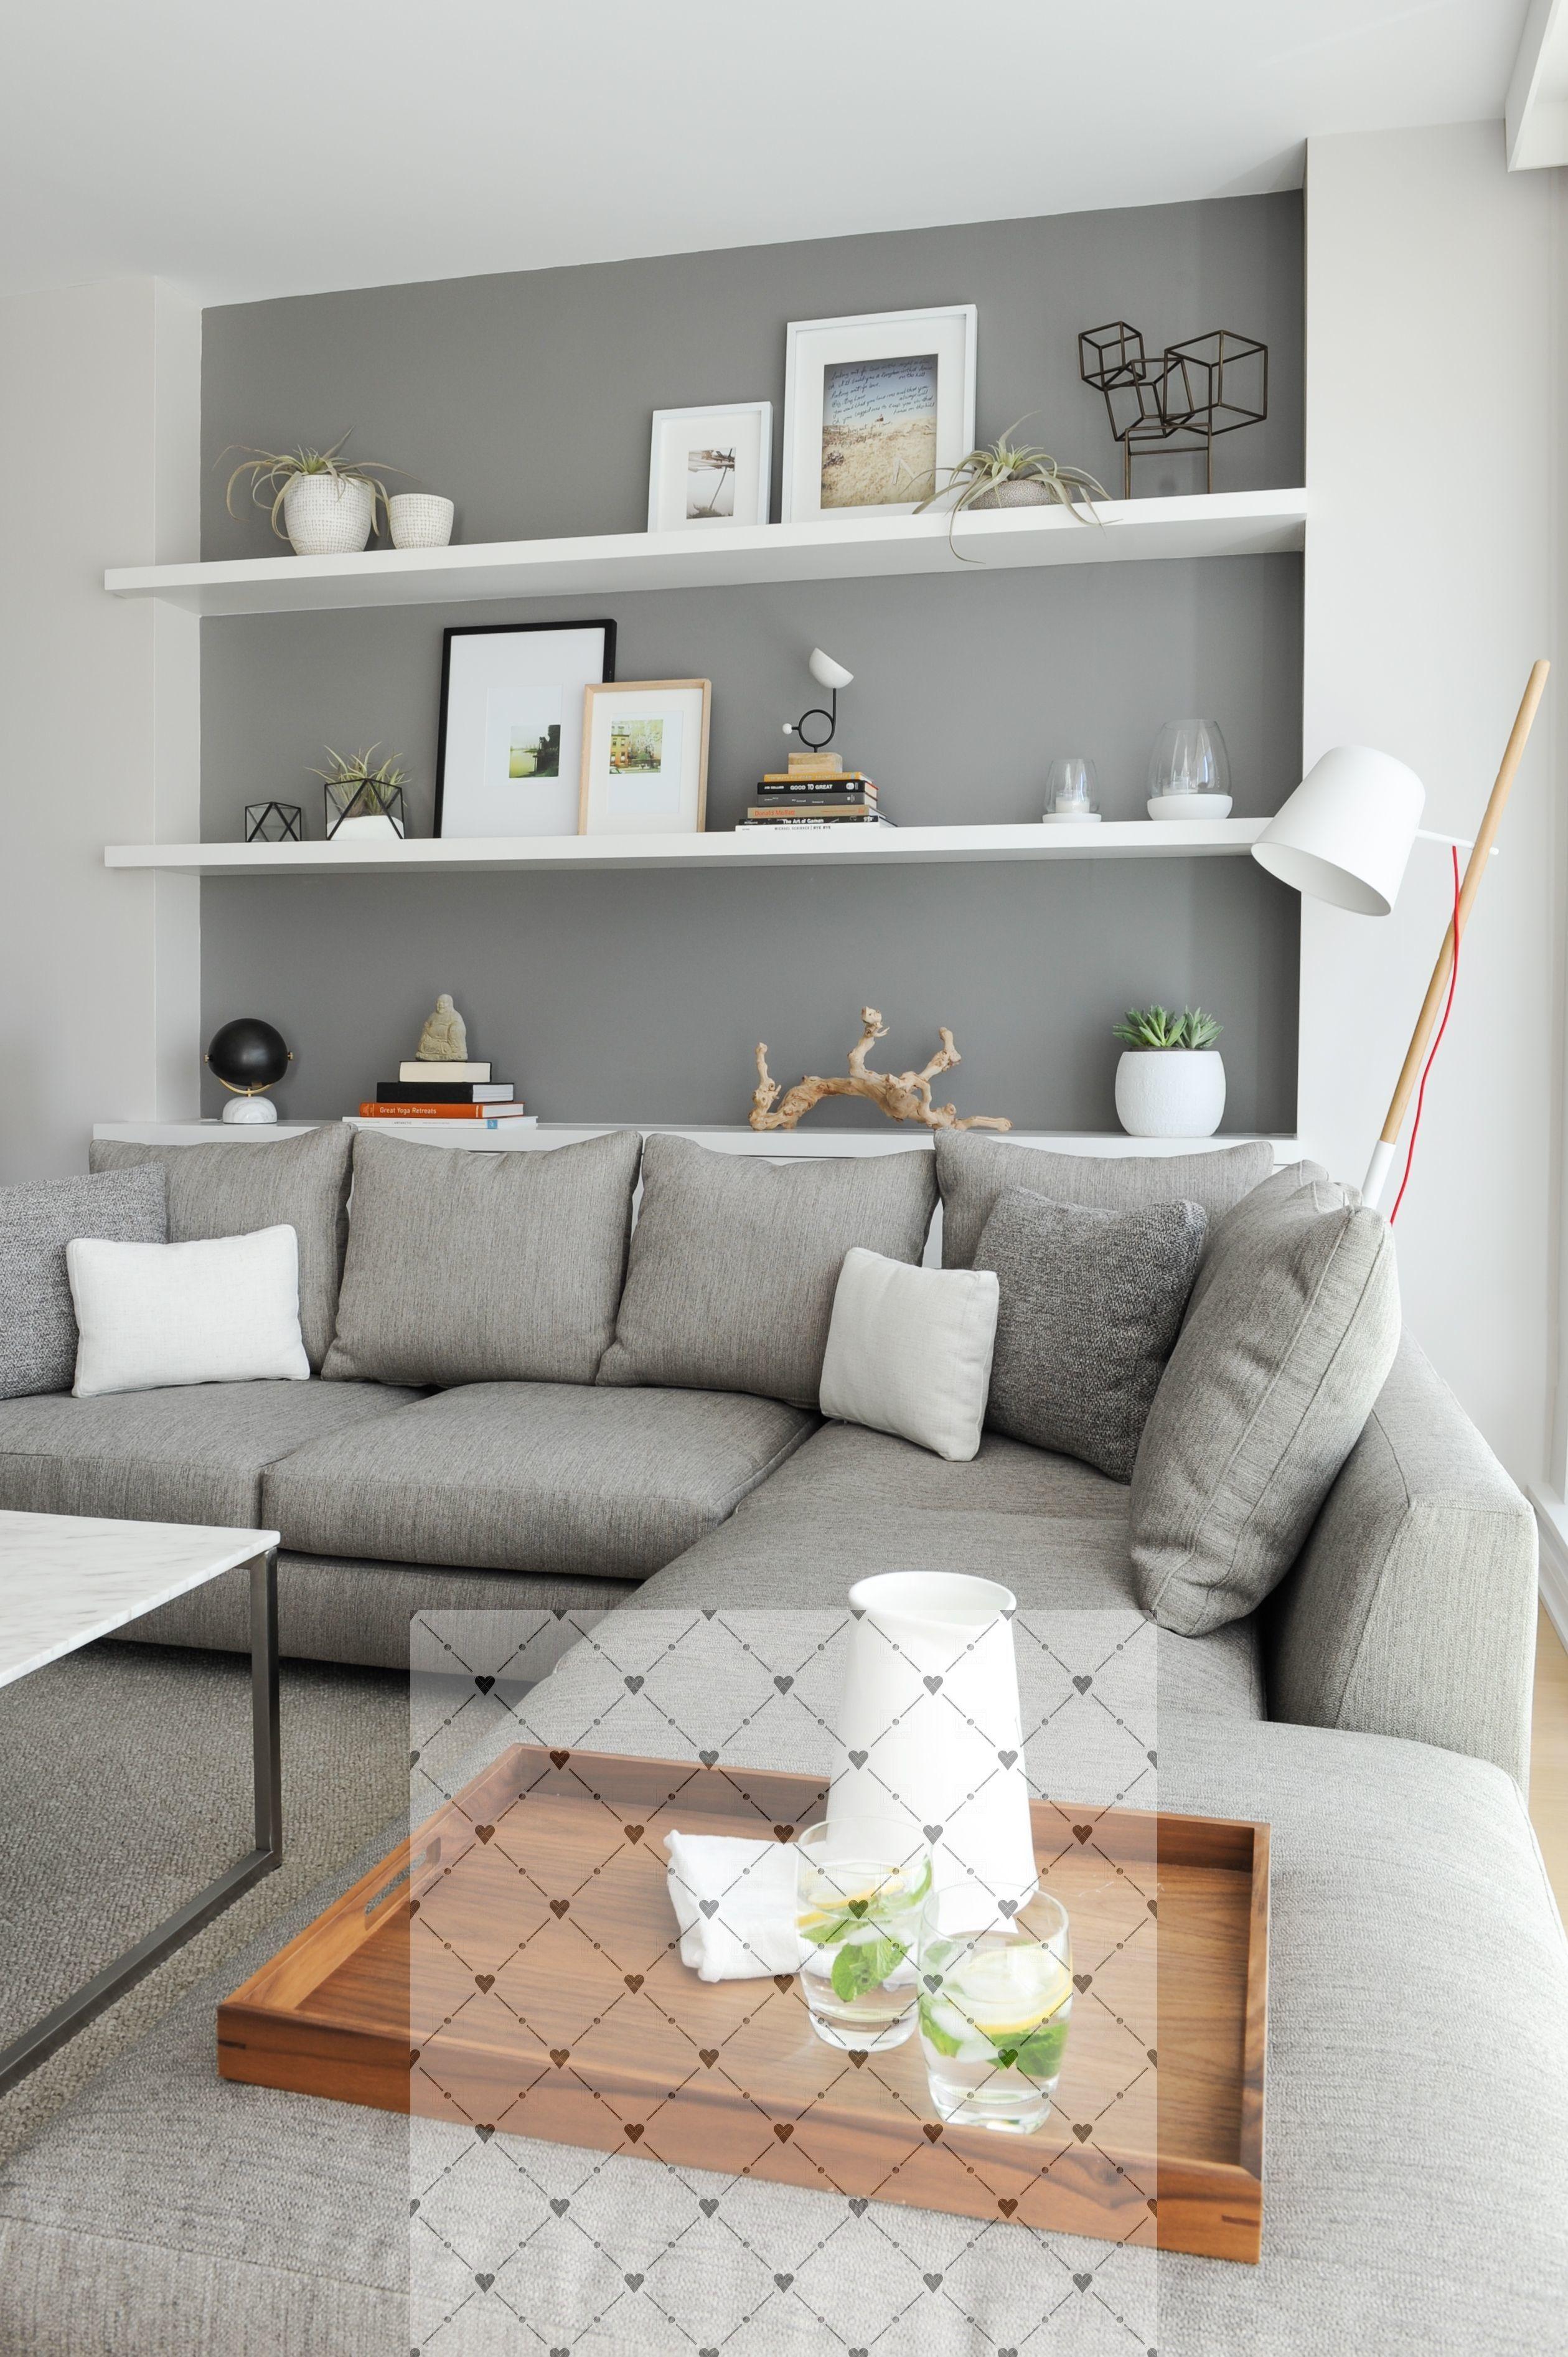 Marvelous Diy Ideas Floating Shelf Bookcase Wall Colors Ikea Floating Shelves Hallwa Living Room Shelves Floating Shelves Living Room Living Room Decor Rustic #rustic #living #room #shelves